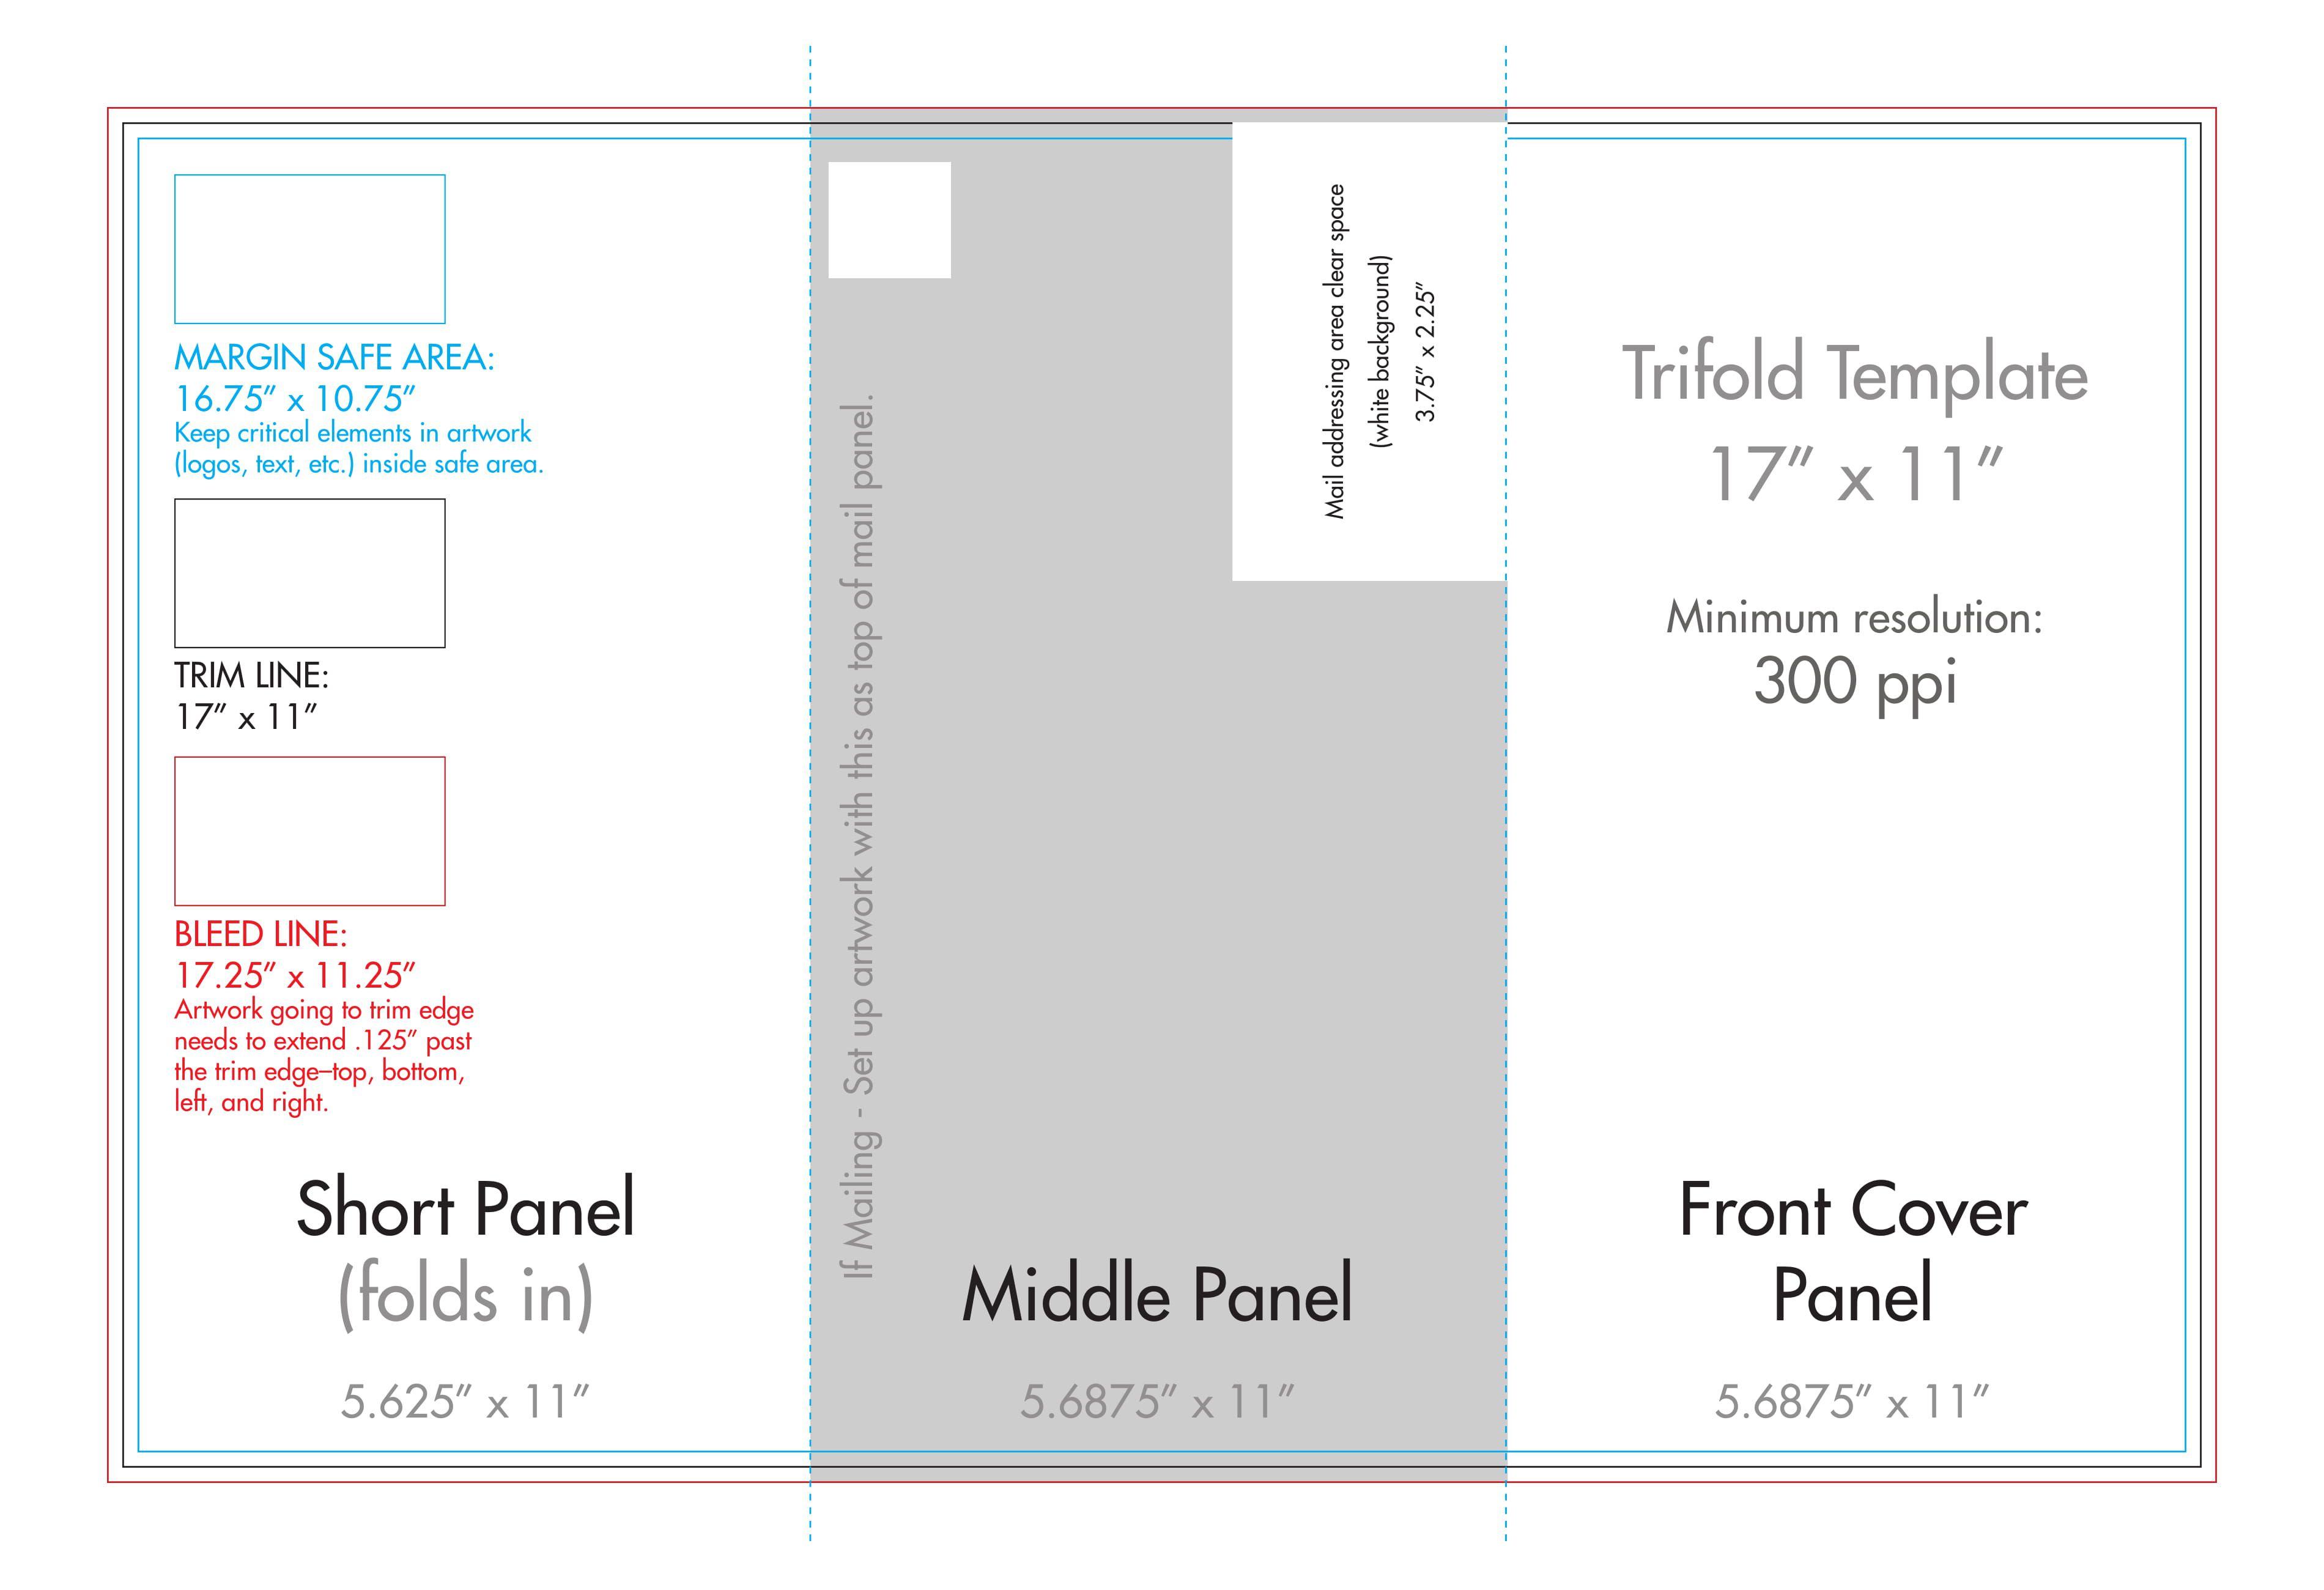 006 Rare Tri Fold Brochure Template Word Photo  2010 2007 FreeFull